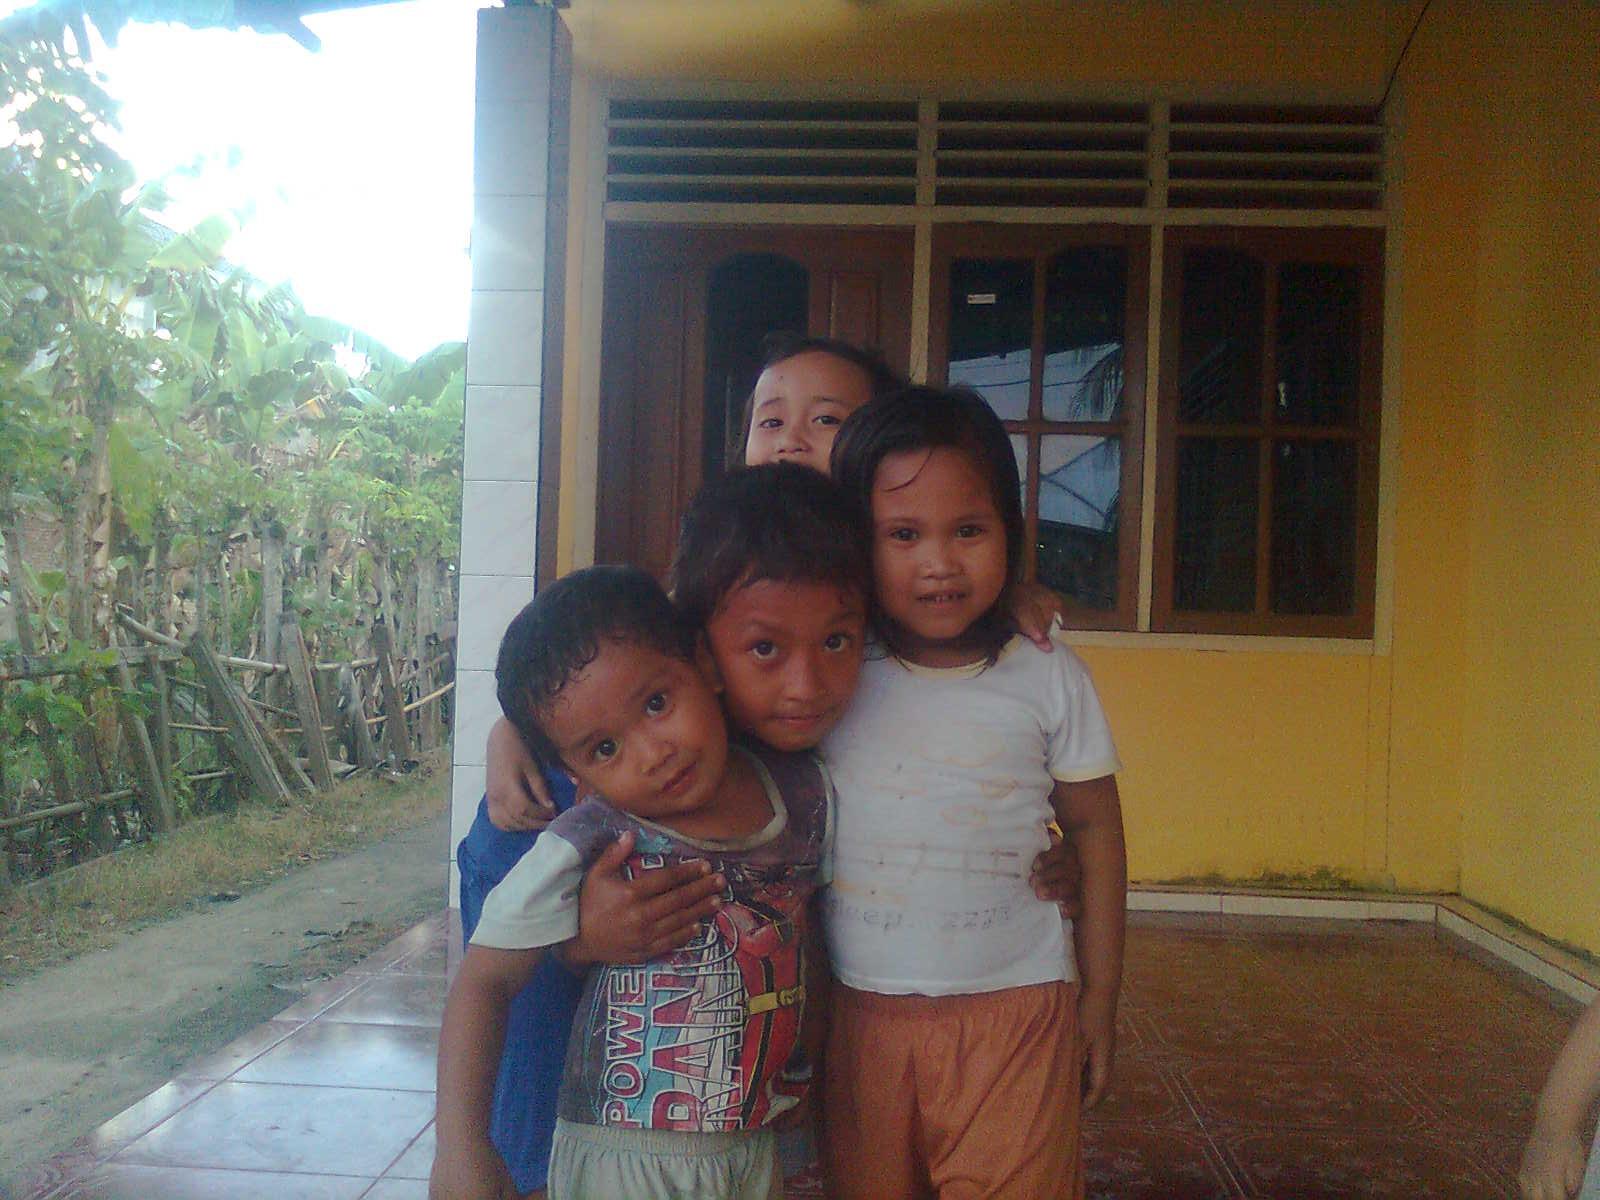 Anak Anak Lucu Dari Gorontalo 6 NasihatGuruku